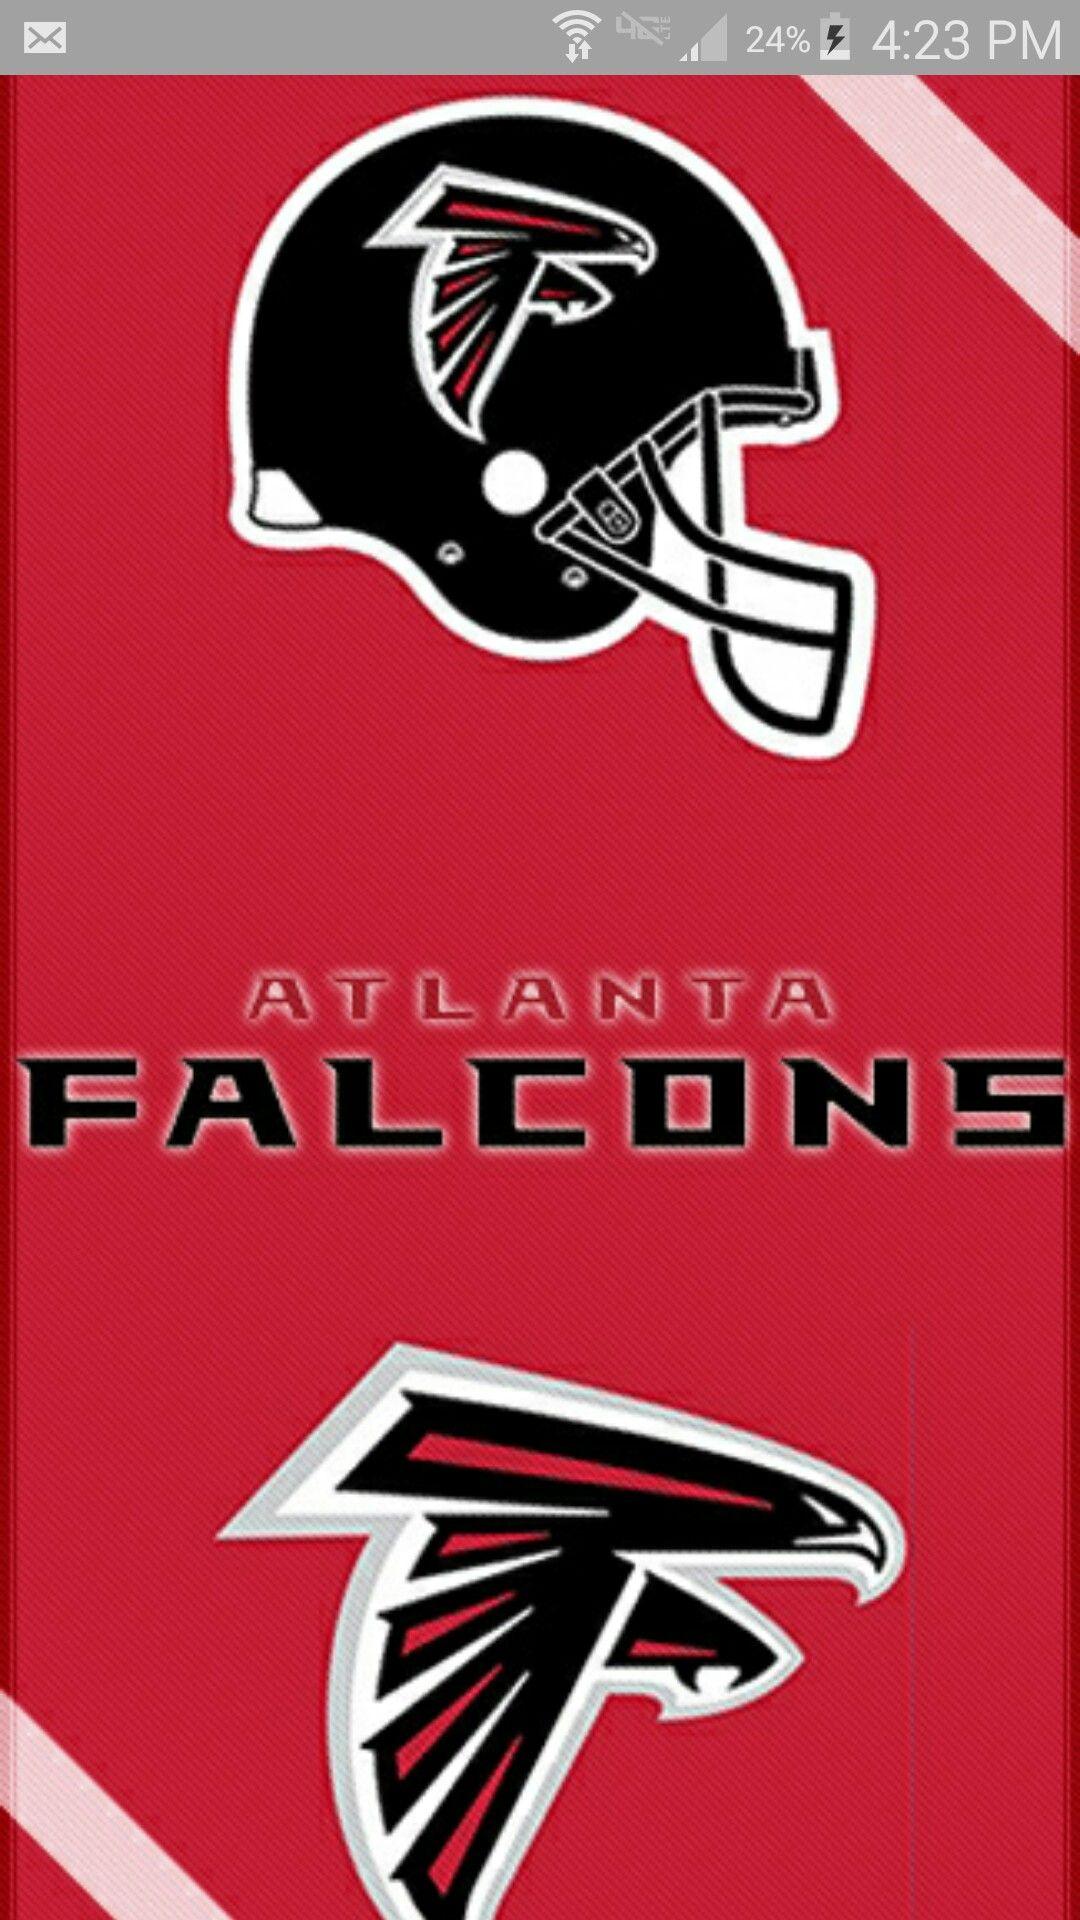 Pin By Kelley Myrick On Falcons Fan Atlanta Falcons Football Falcons Football Nfl Football